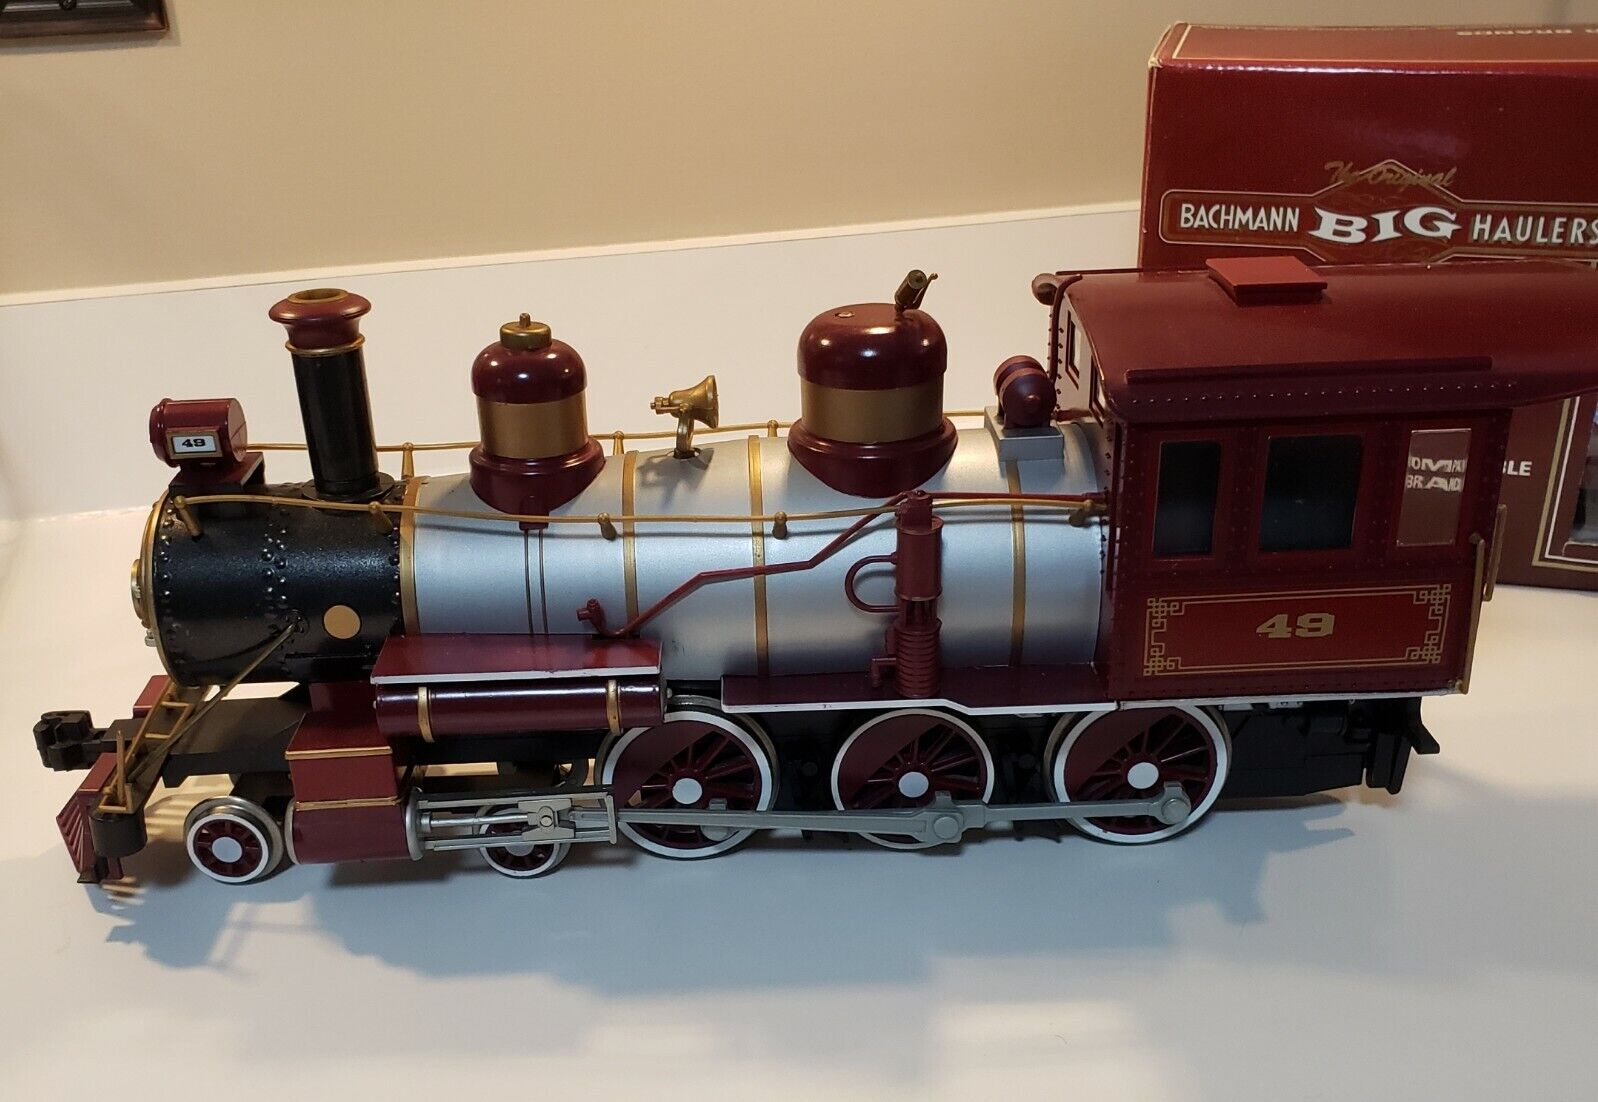 Bachmann G Scale 4 Piece Train Set with Steam Locomotive & Sound